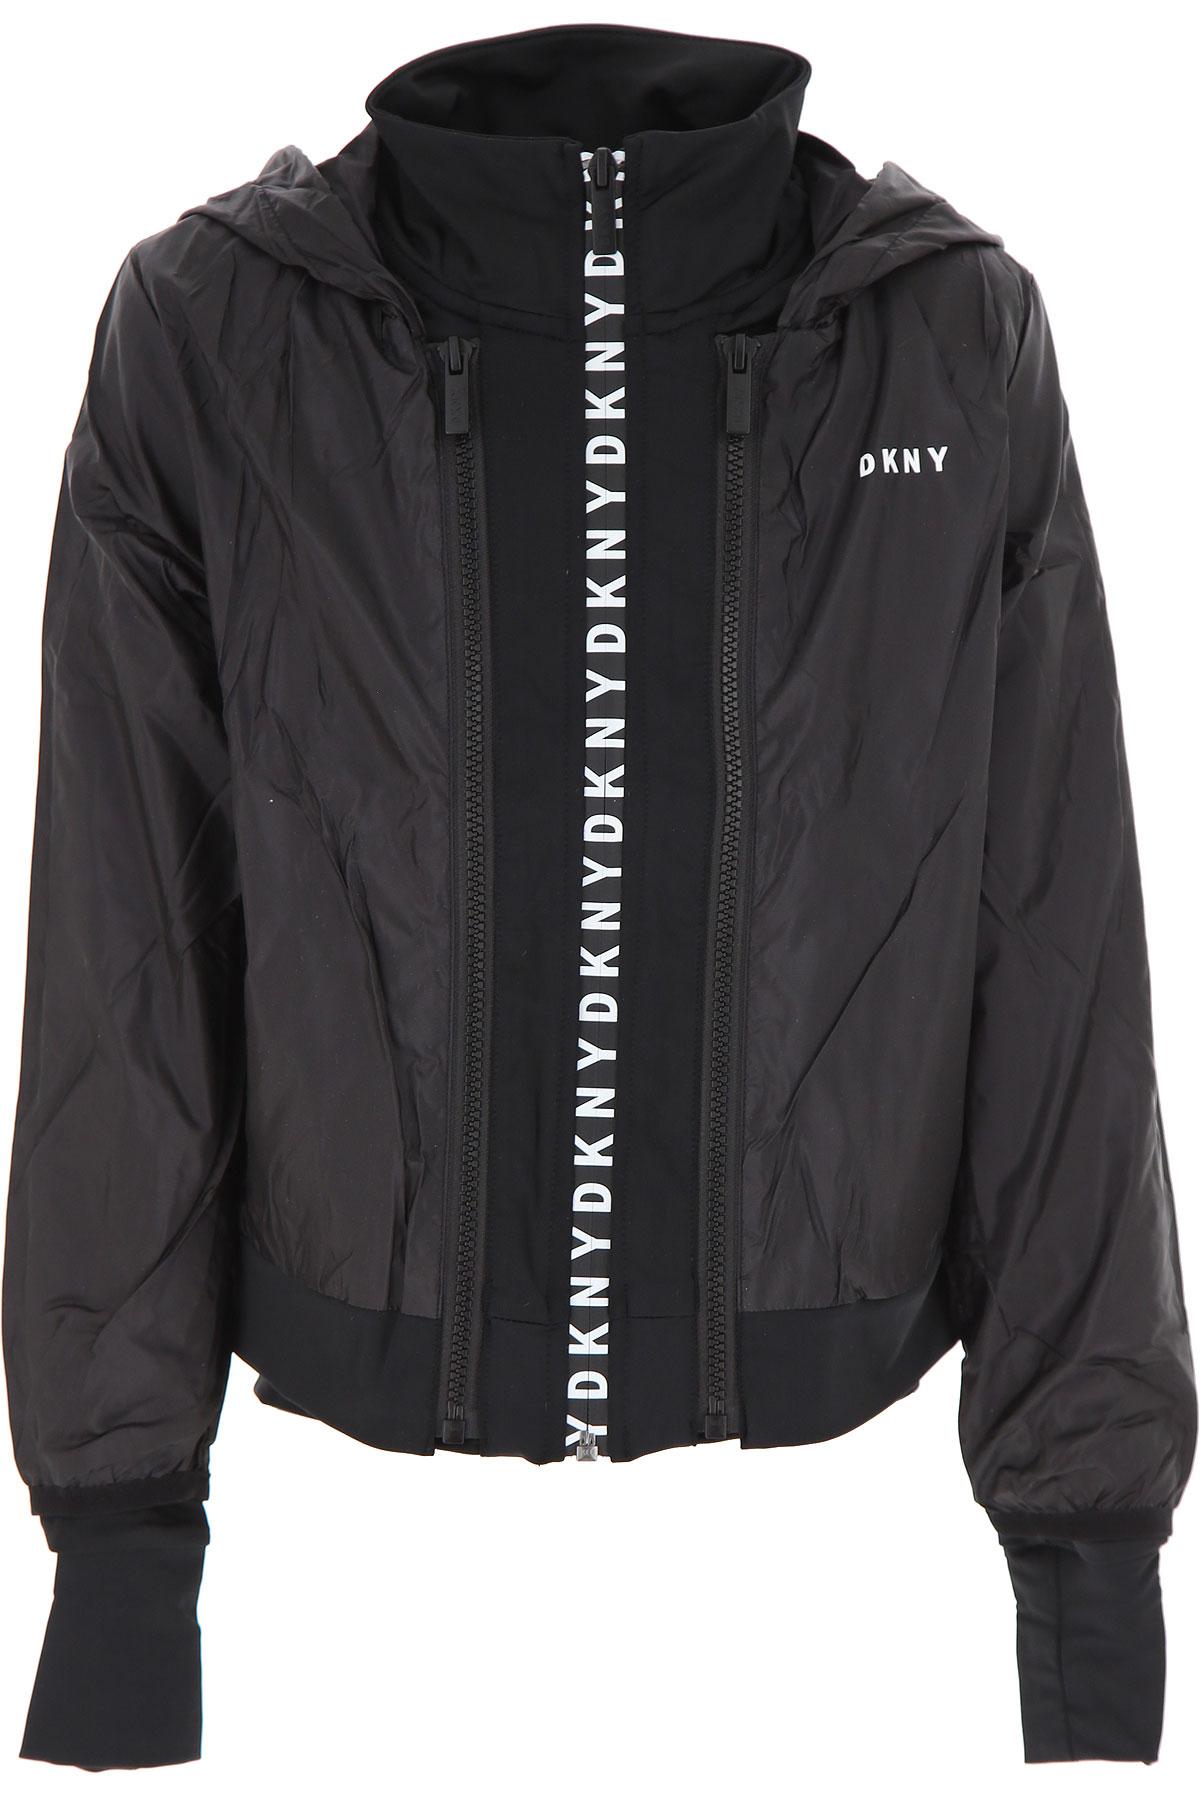 DKNY Kids Jacket for Girls On Sale, Black, polyamide, 2019, 10Y 6Y 8Y